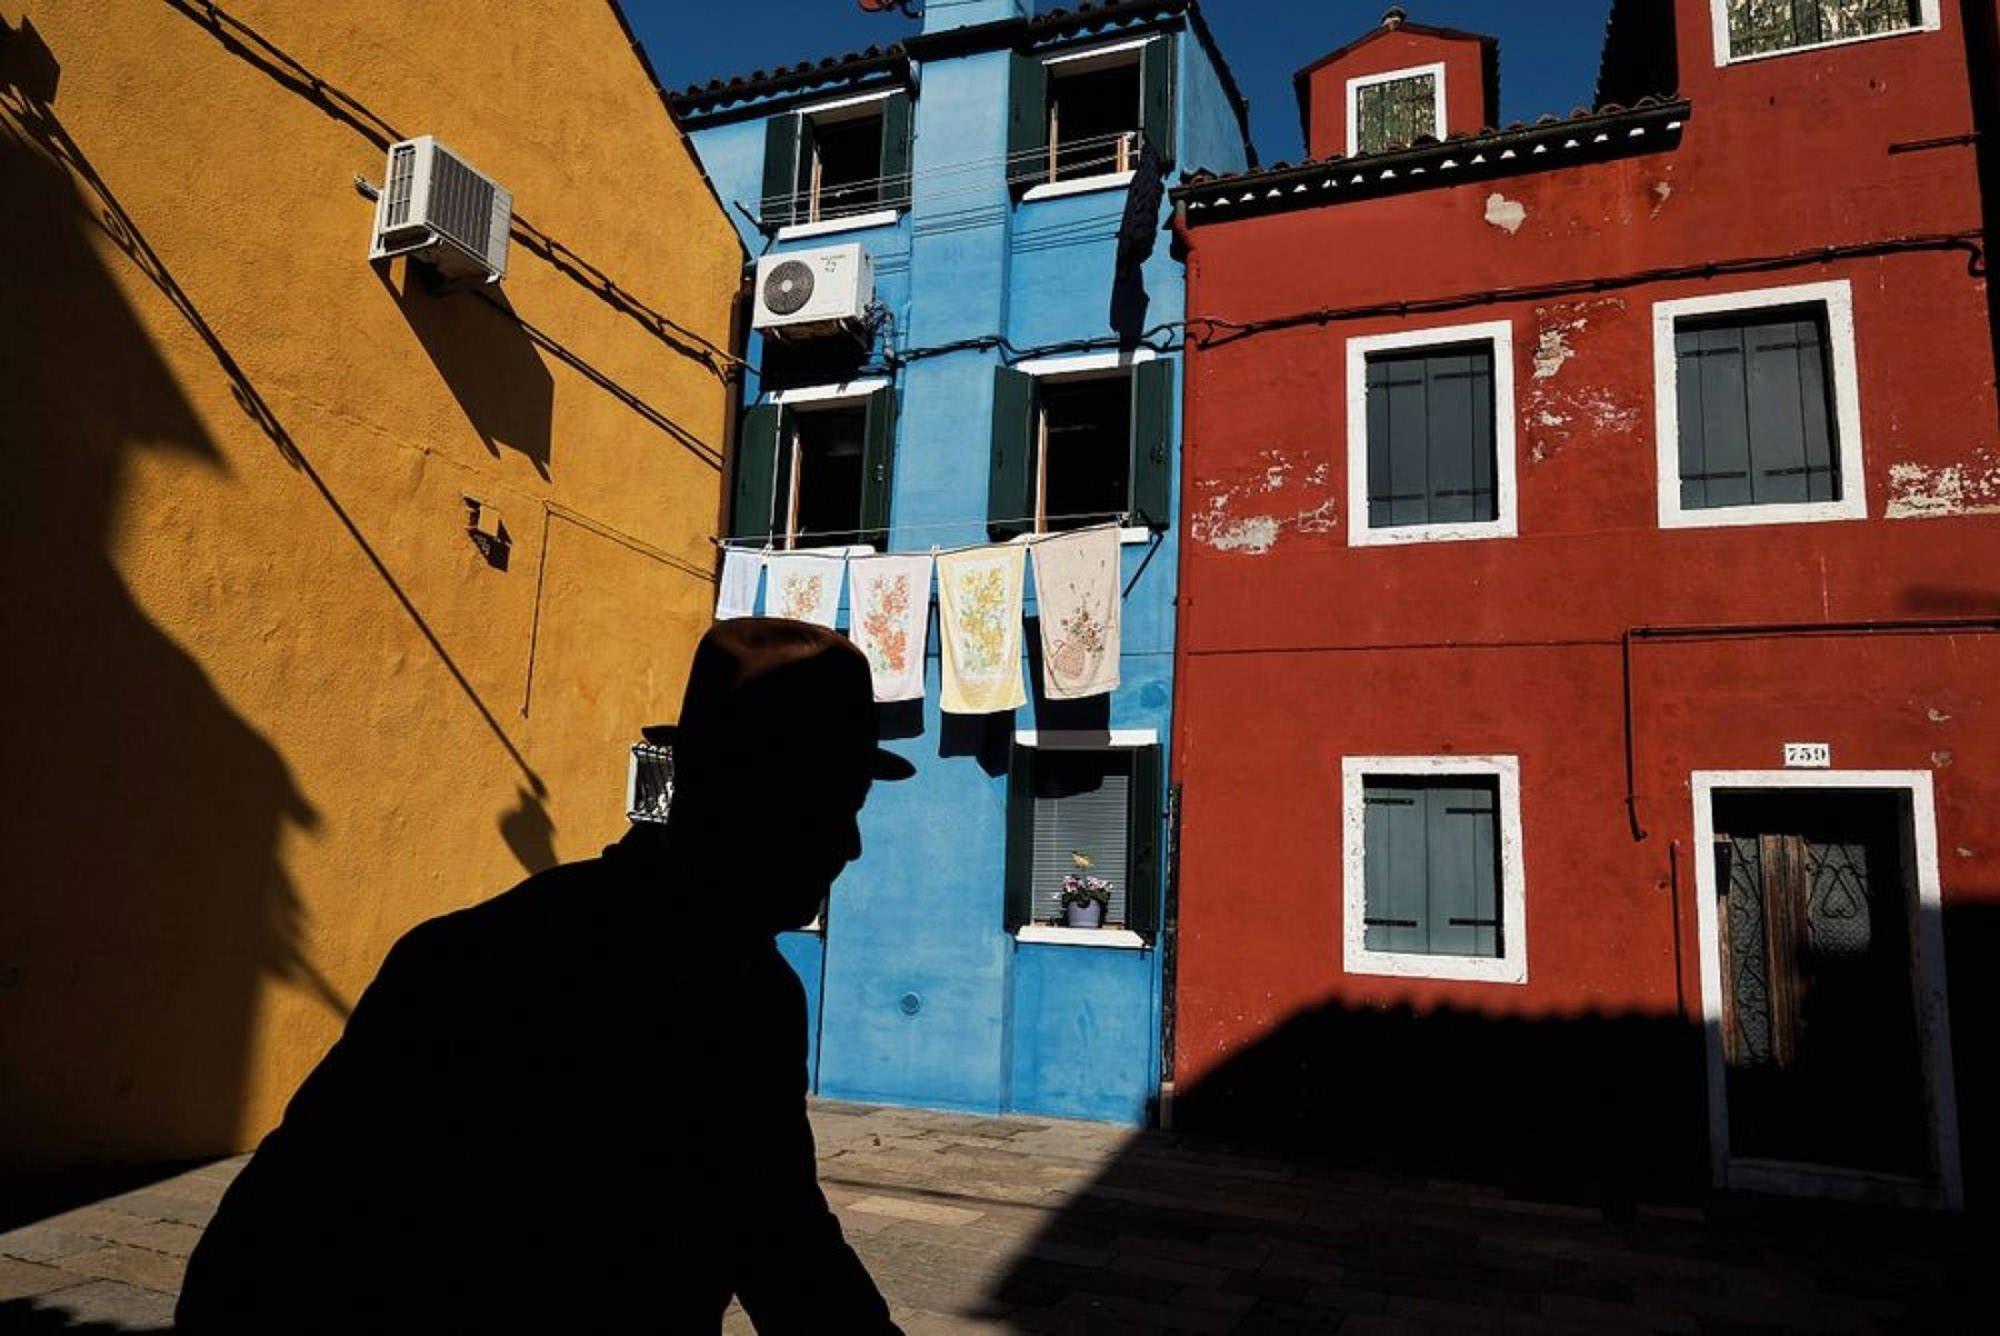 B-Uranus - colorful street houses in Venice, Italy, by photographer Mirko Saviane